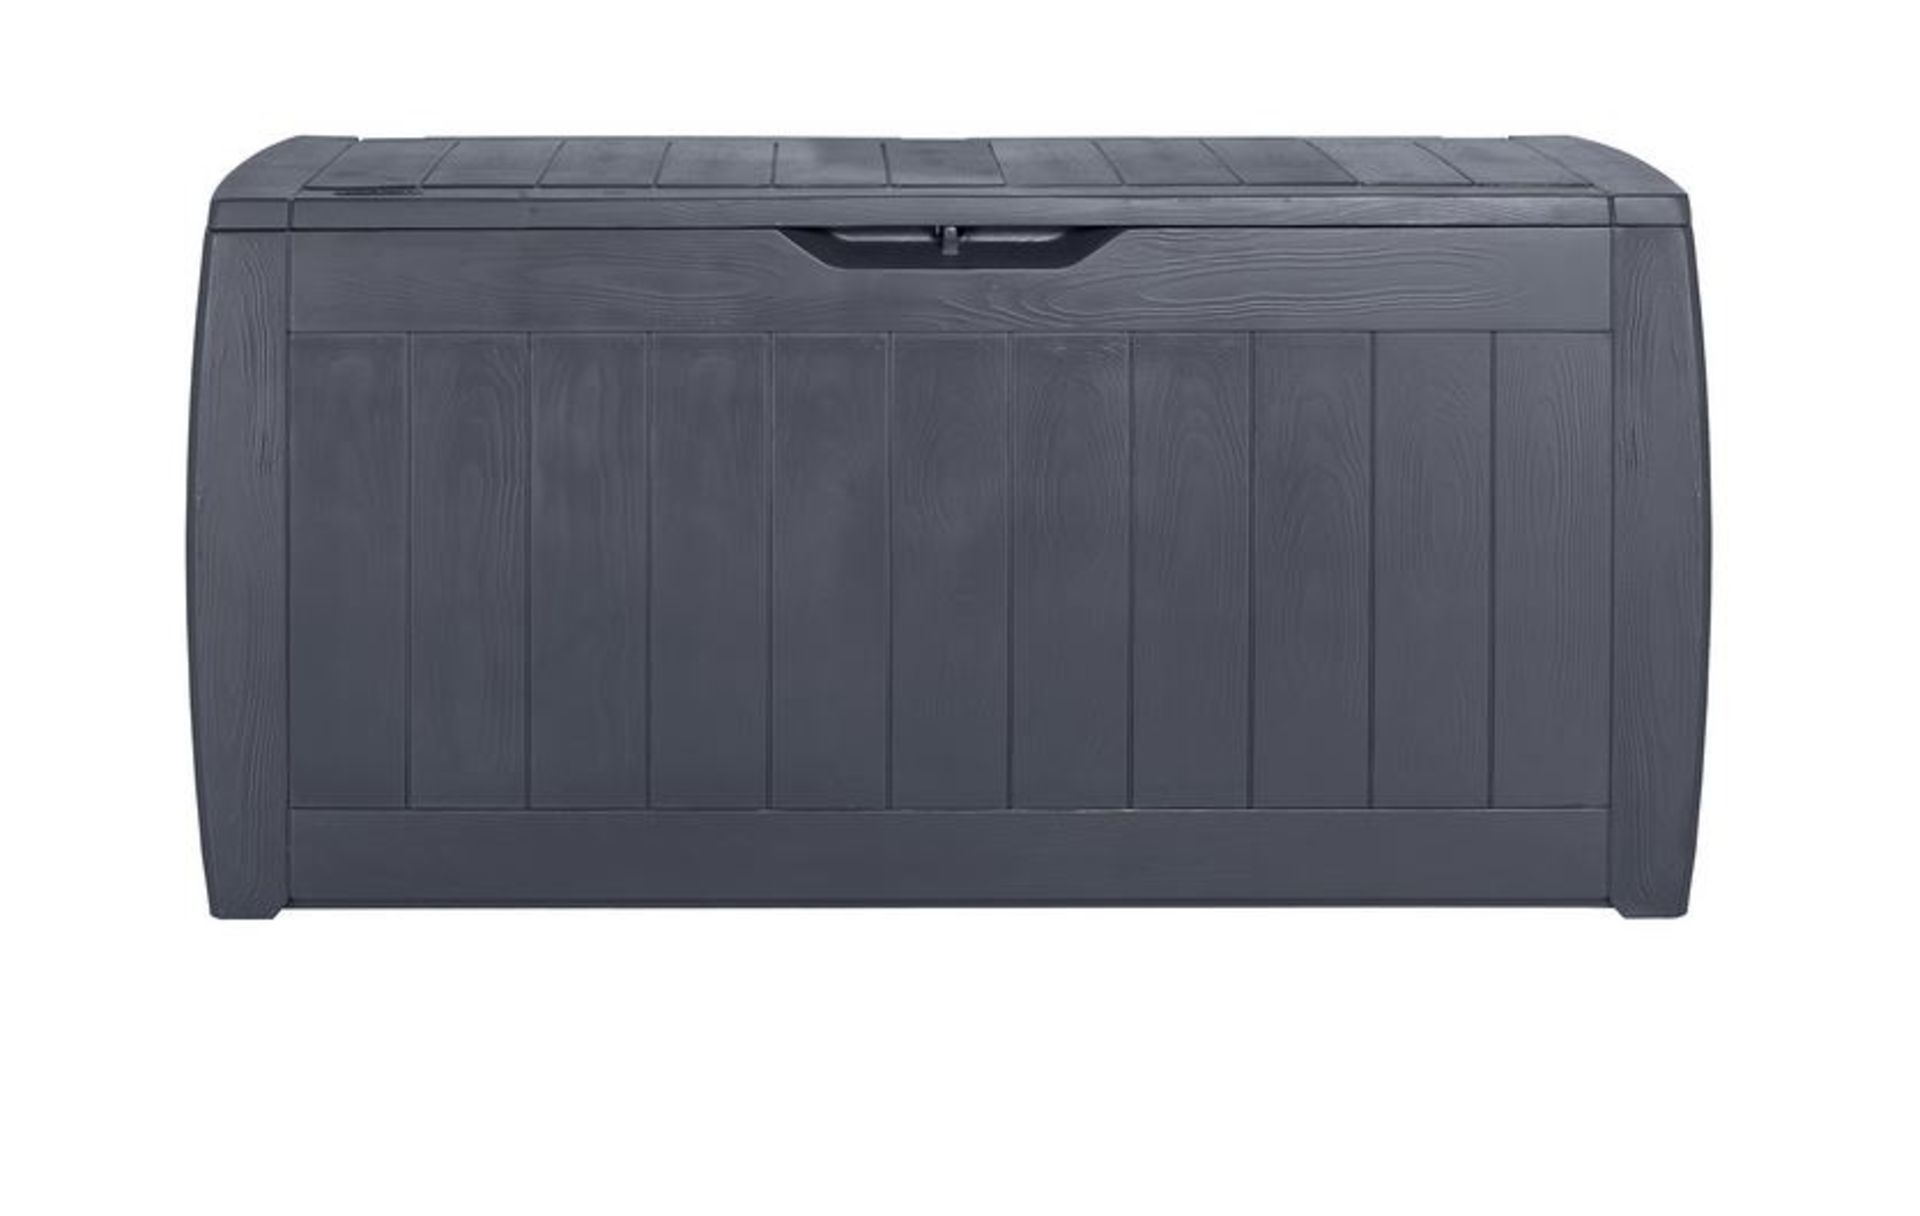 (P10) 4x Keter Hollywood Garden Storage Unit 270L RRP £30 Each. (L117.3x W44.5x H53cm). (1x Sealed,